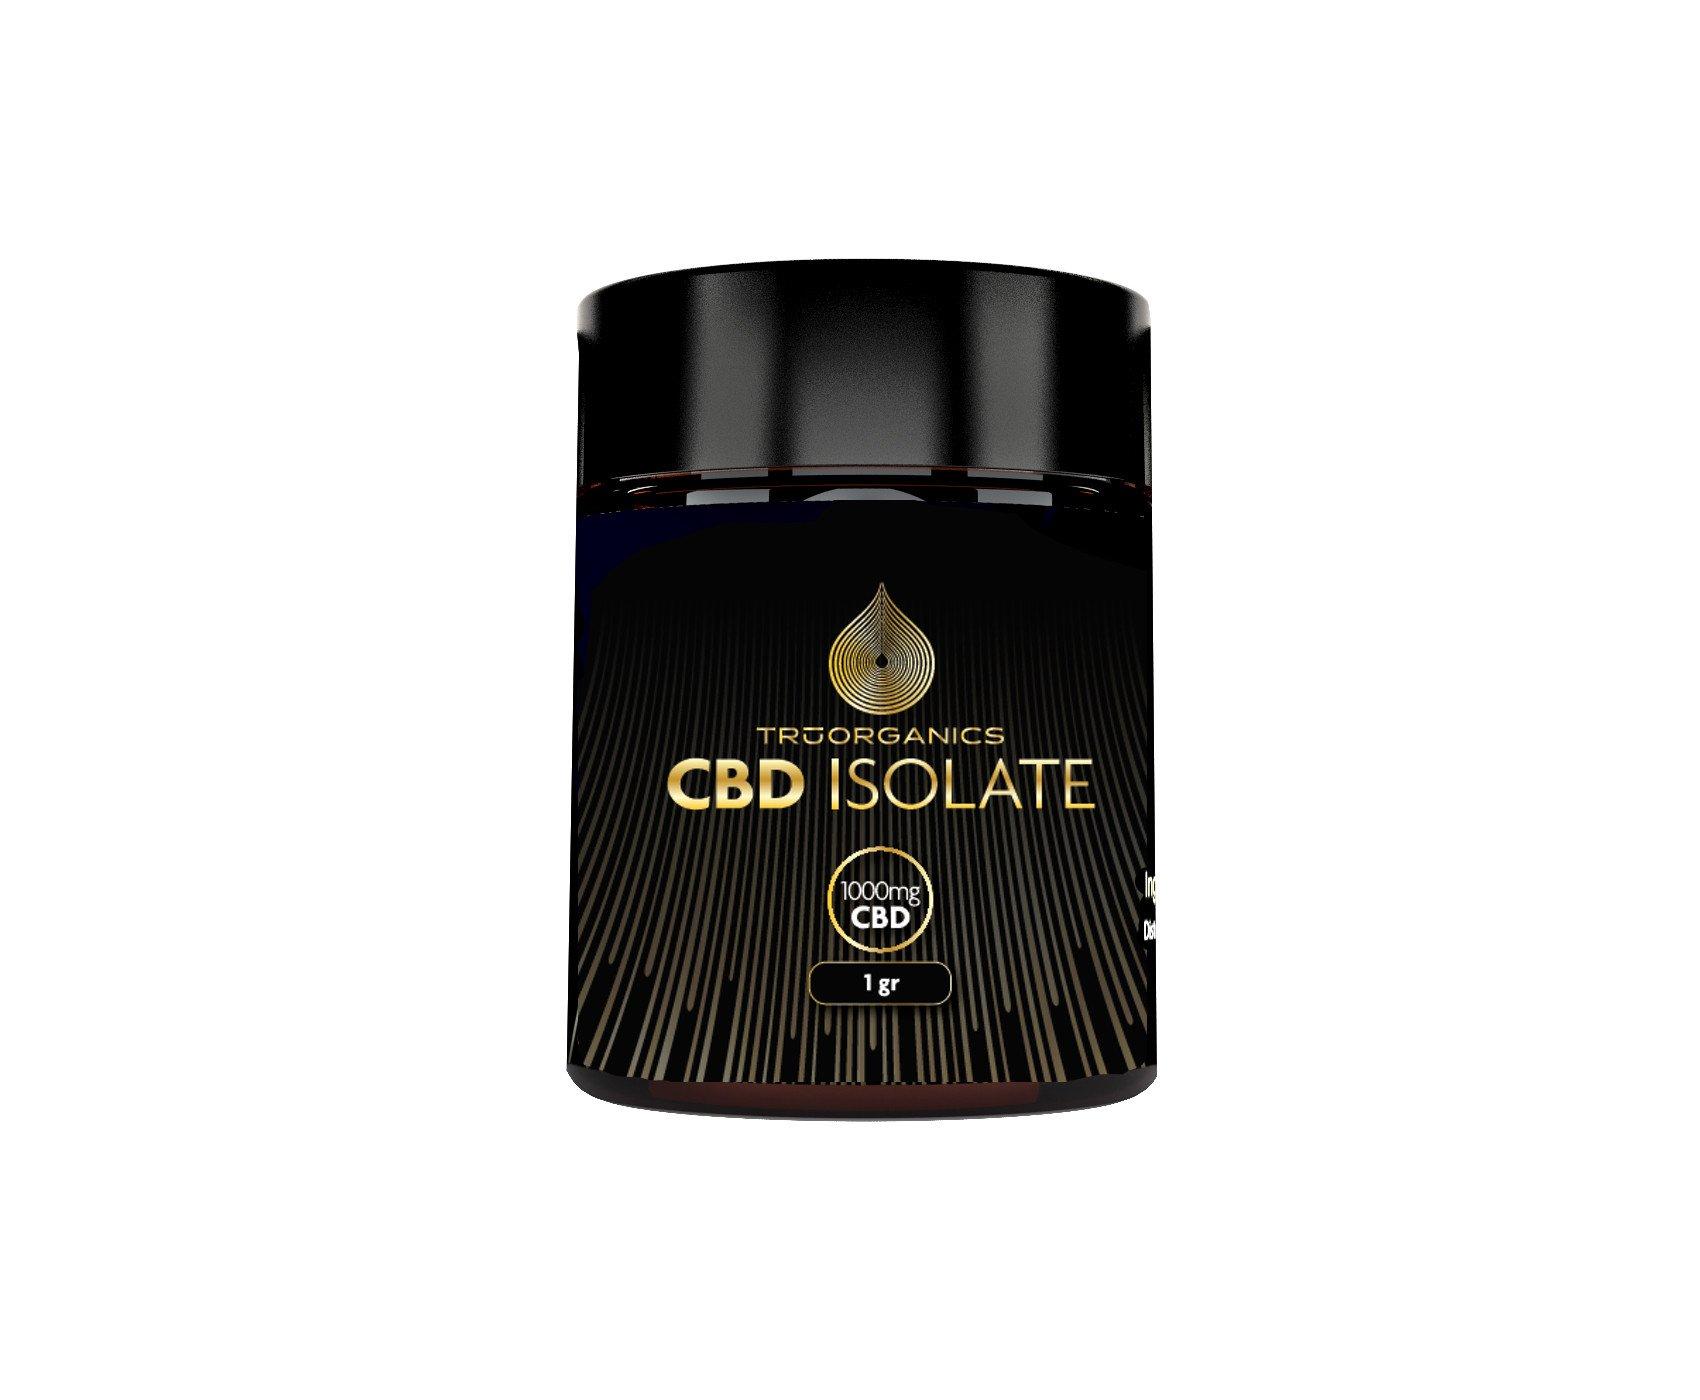 Tru Organics - 99+% Pure CBD Isolate SLAB